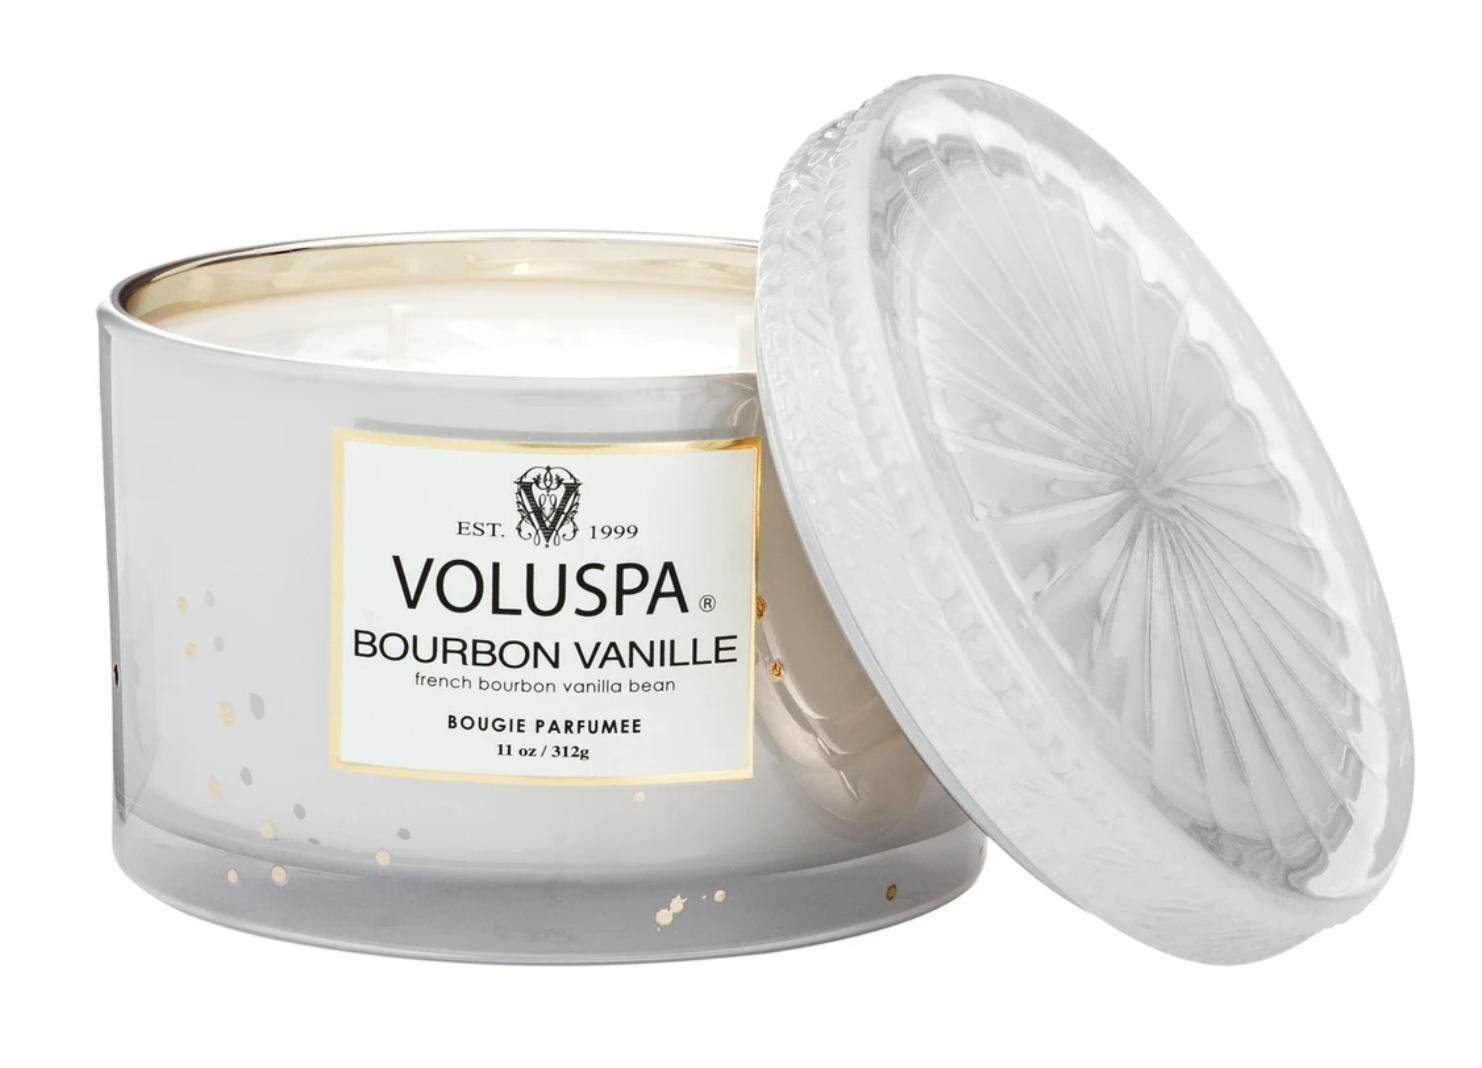 Voluspa Bourbon Vanille, Corta Maison Candle